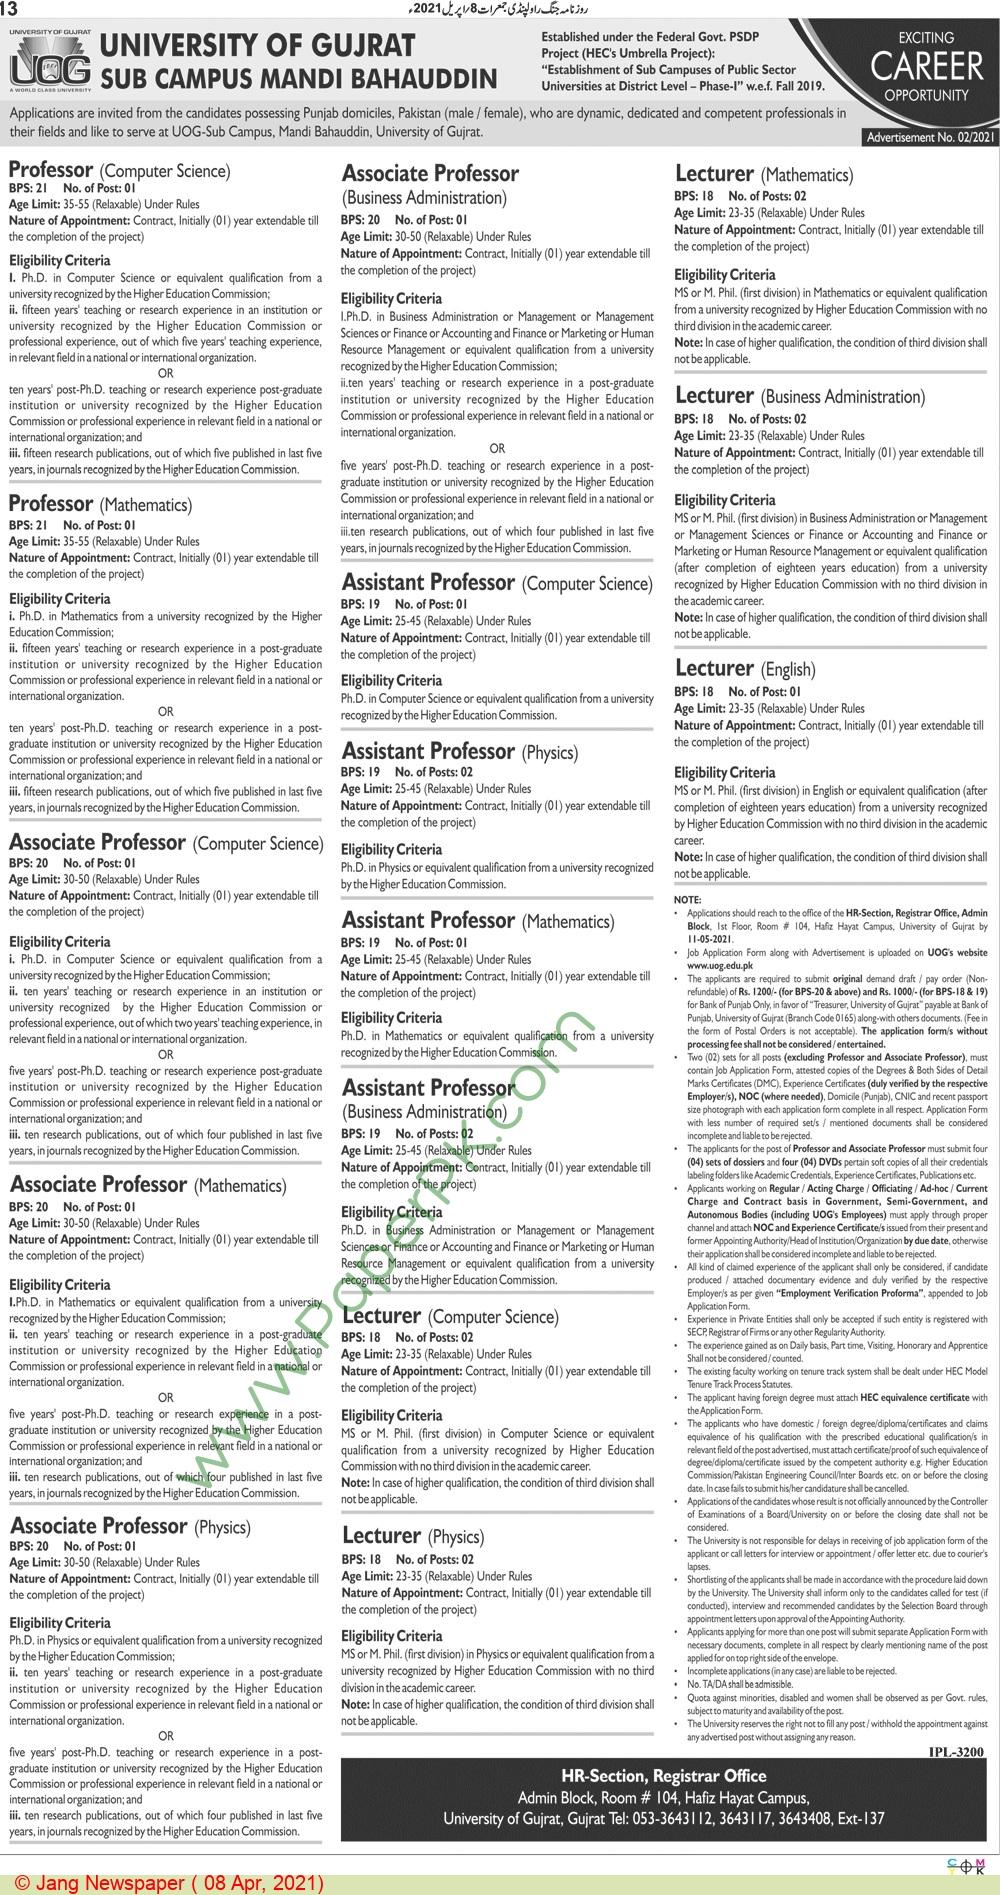 University Of Gujrat jobs newspaper ad for Professor in Gujrat on 2021-04-08